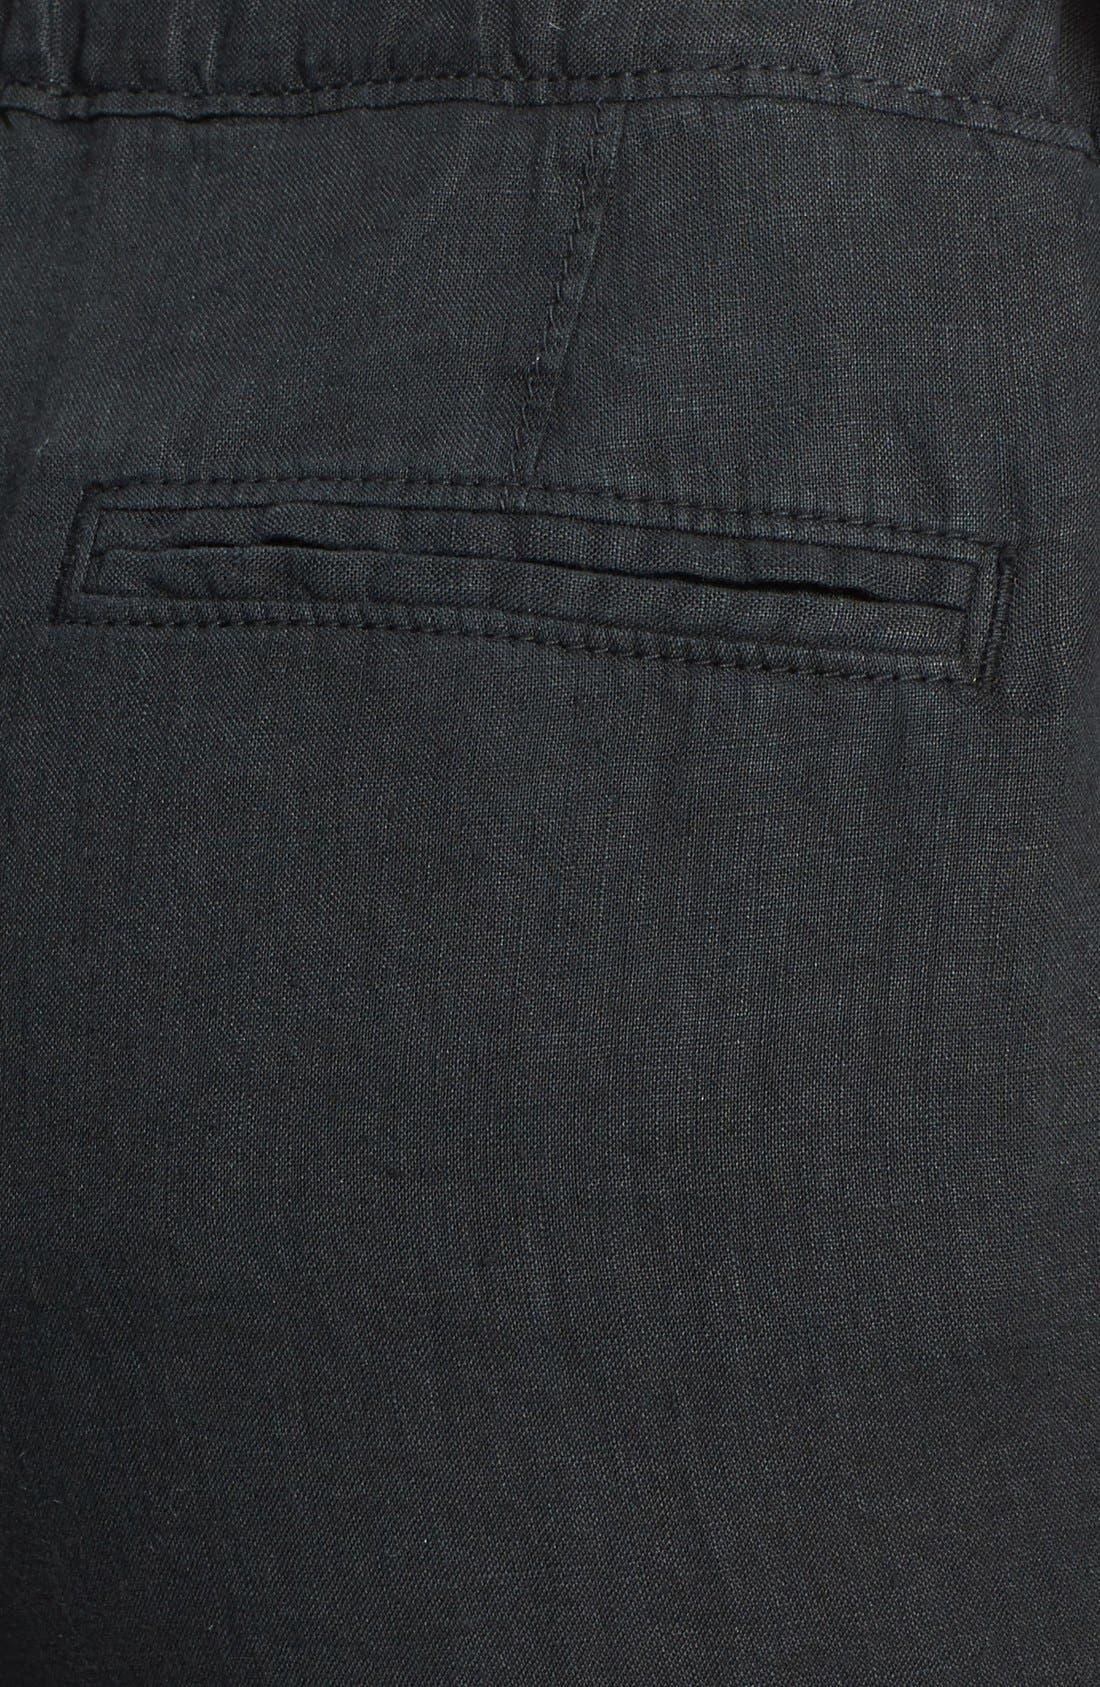 Drawstring Waist Linen Pants,                             Alternate thumbnail 2, color,                             001